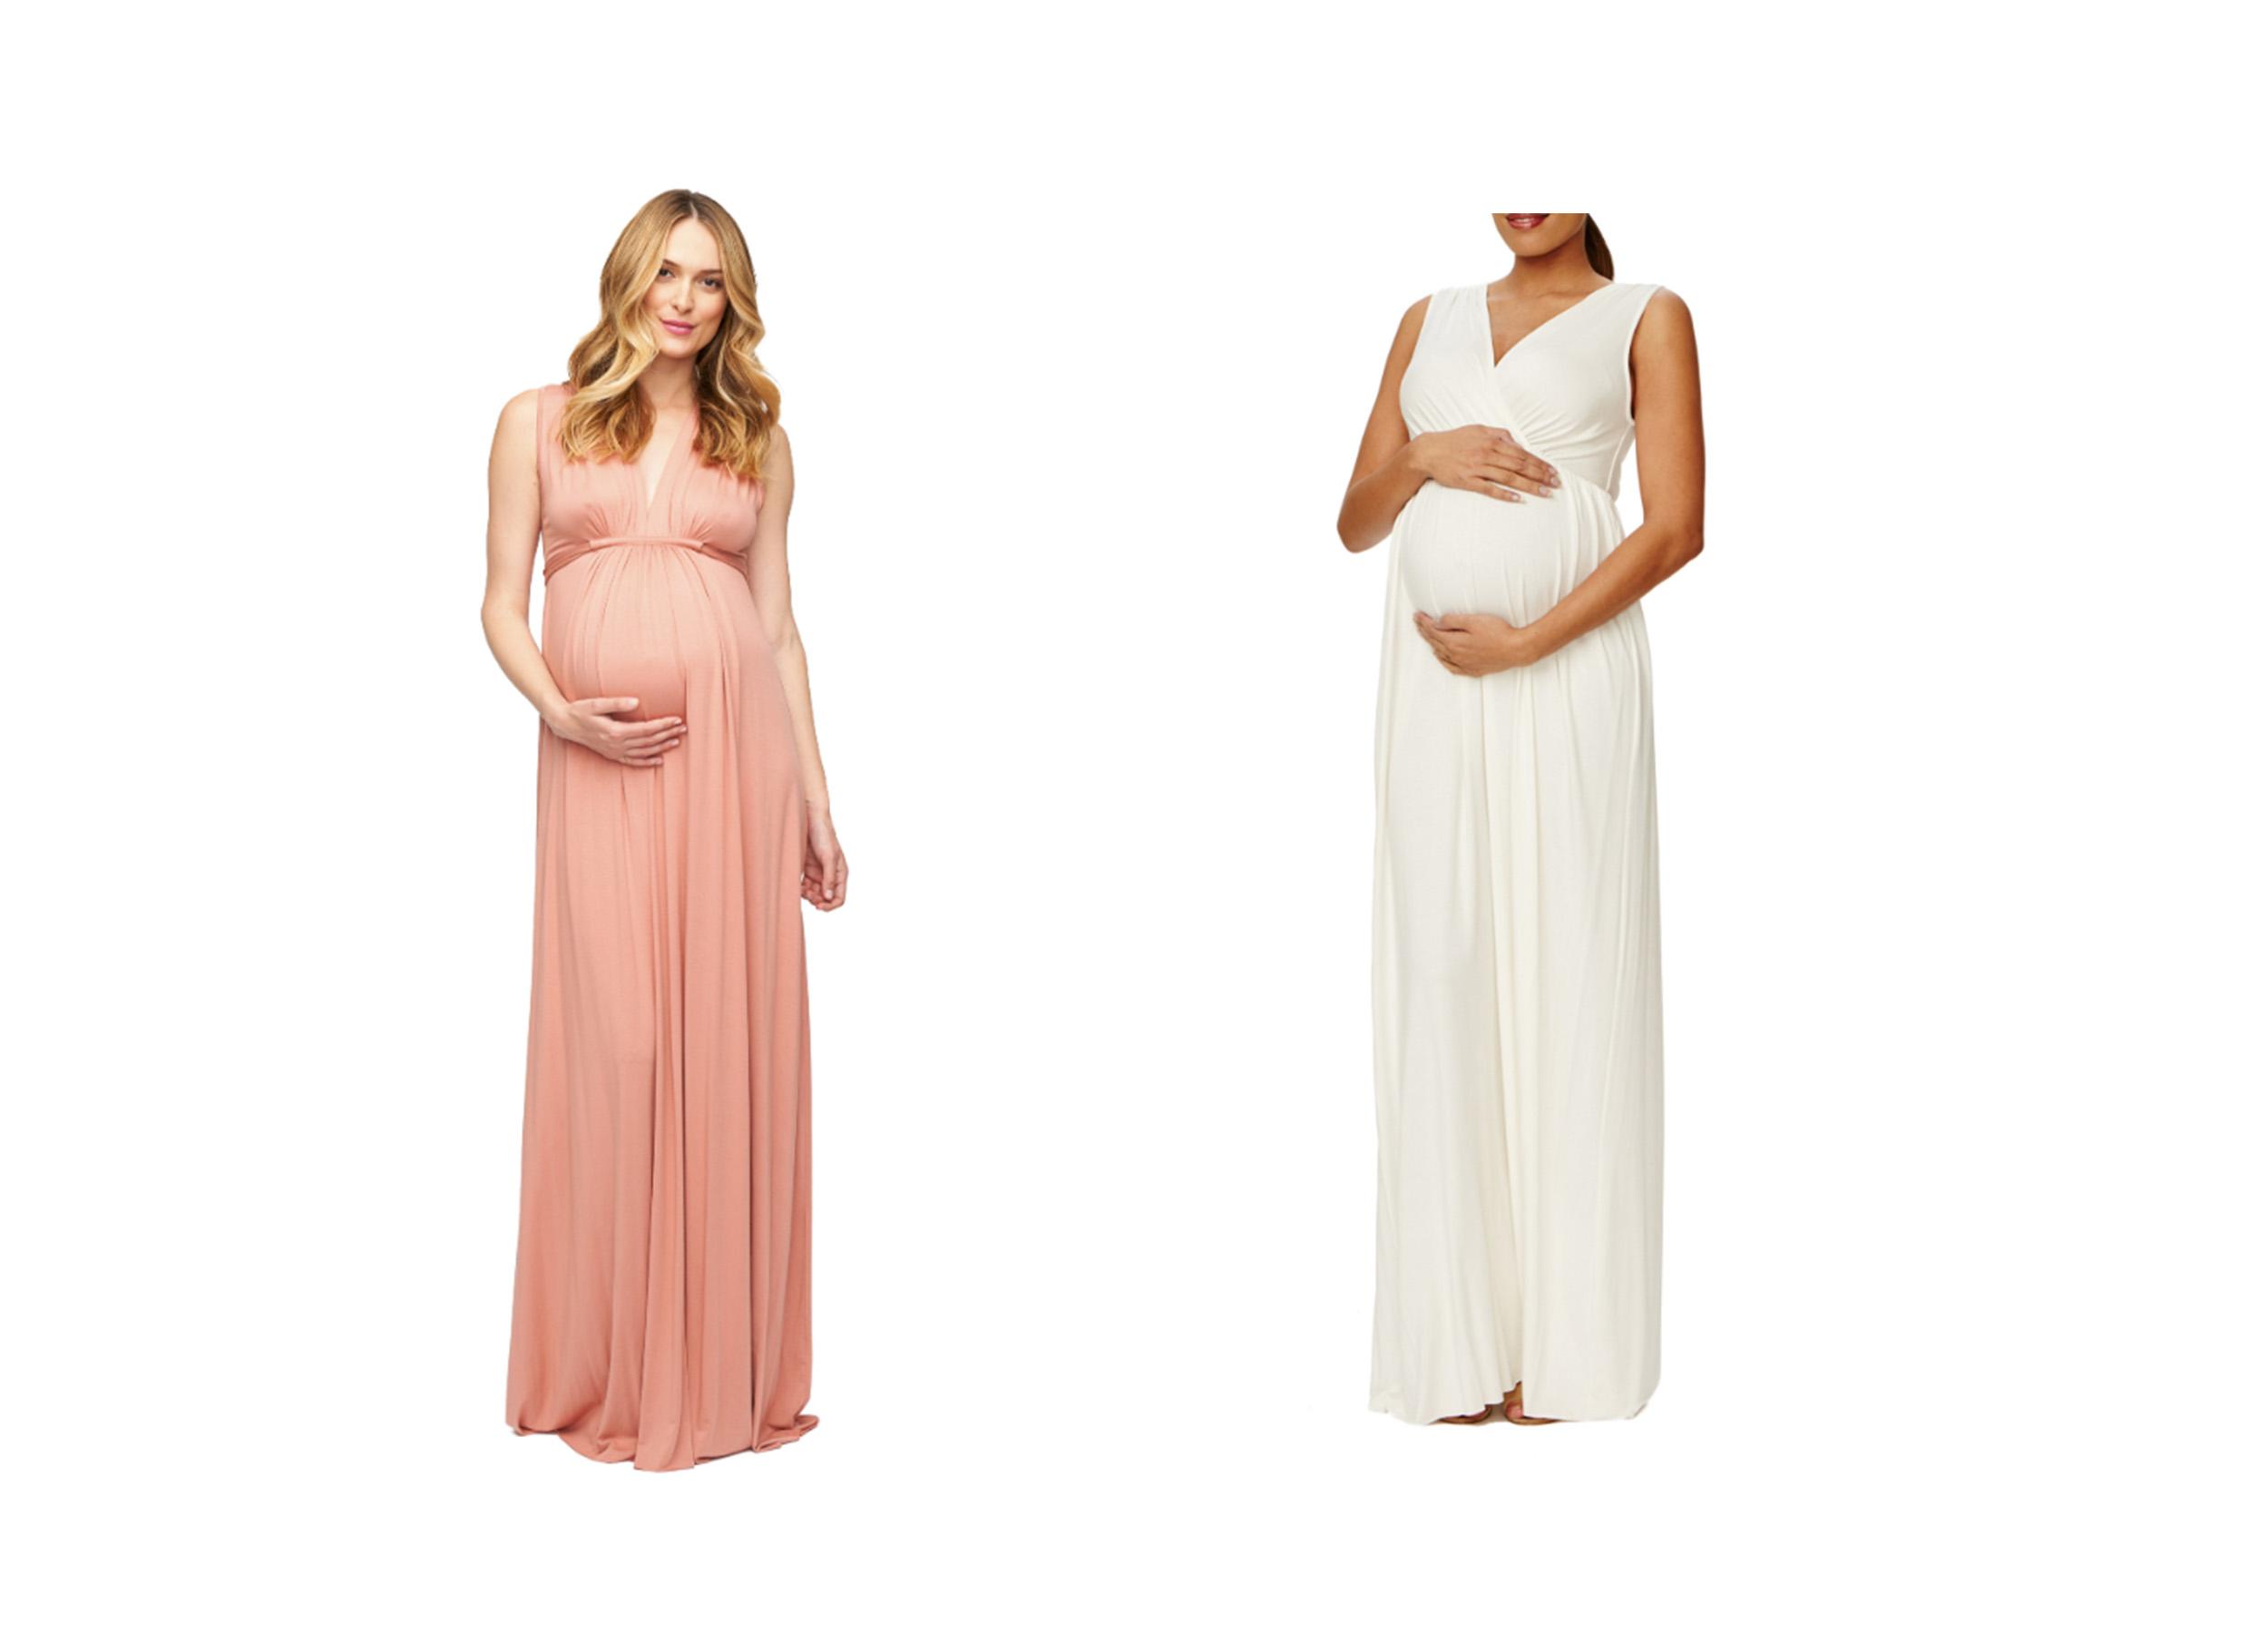 Louisville KY Maternity Photographer | Julie Brock Photography | Louisville KY Newborn Photographer | Louisville KY Family Photographer